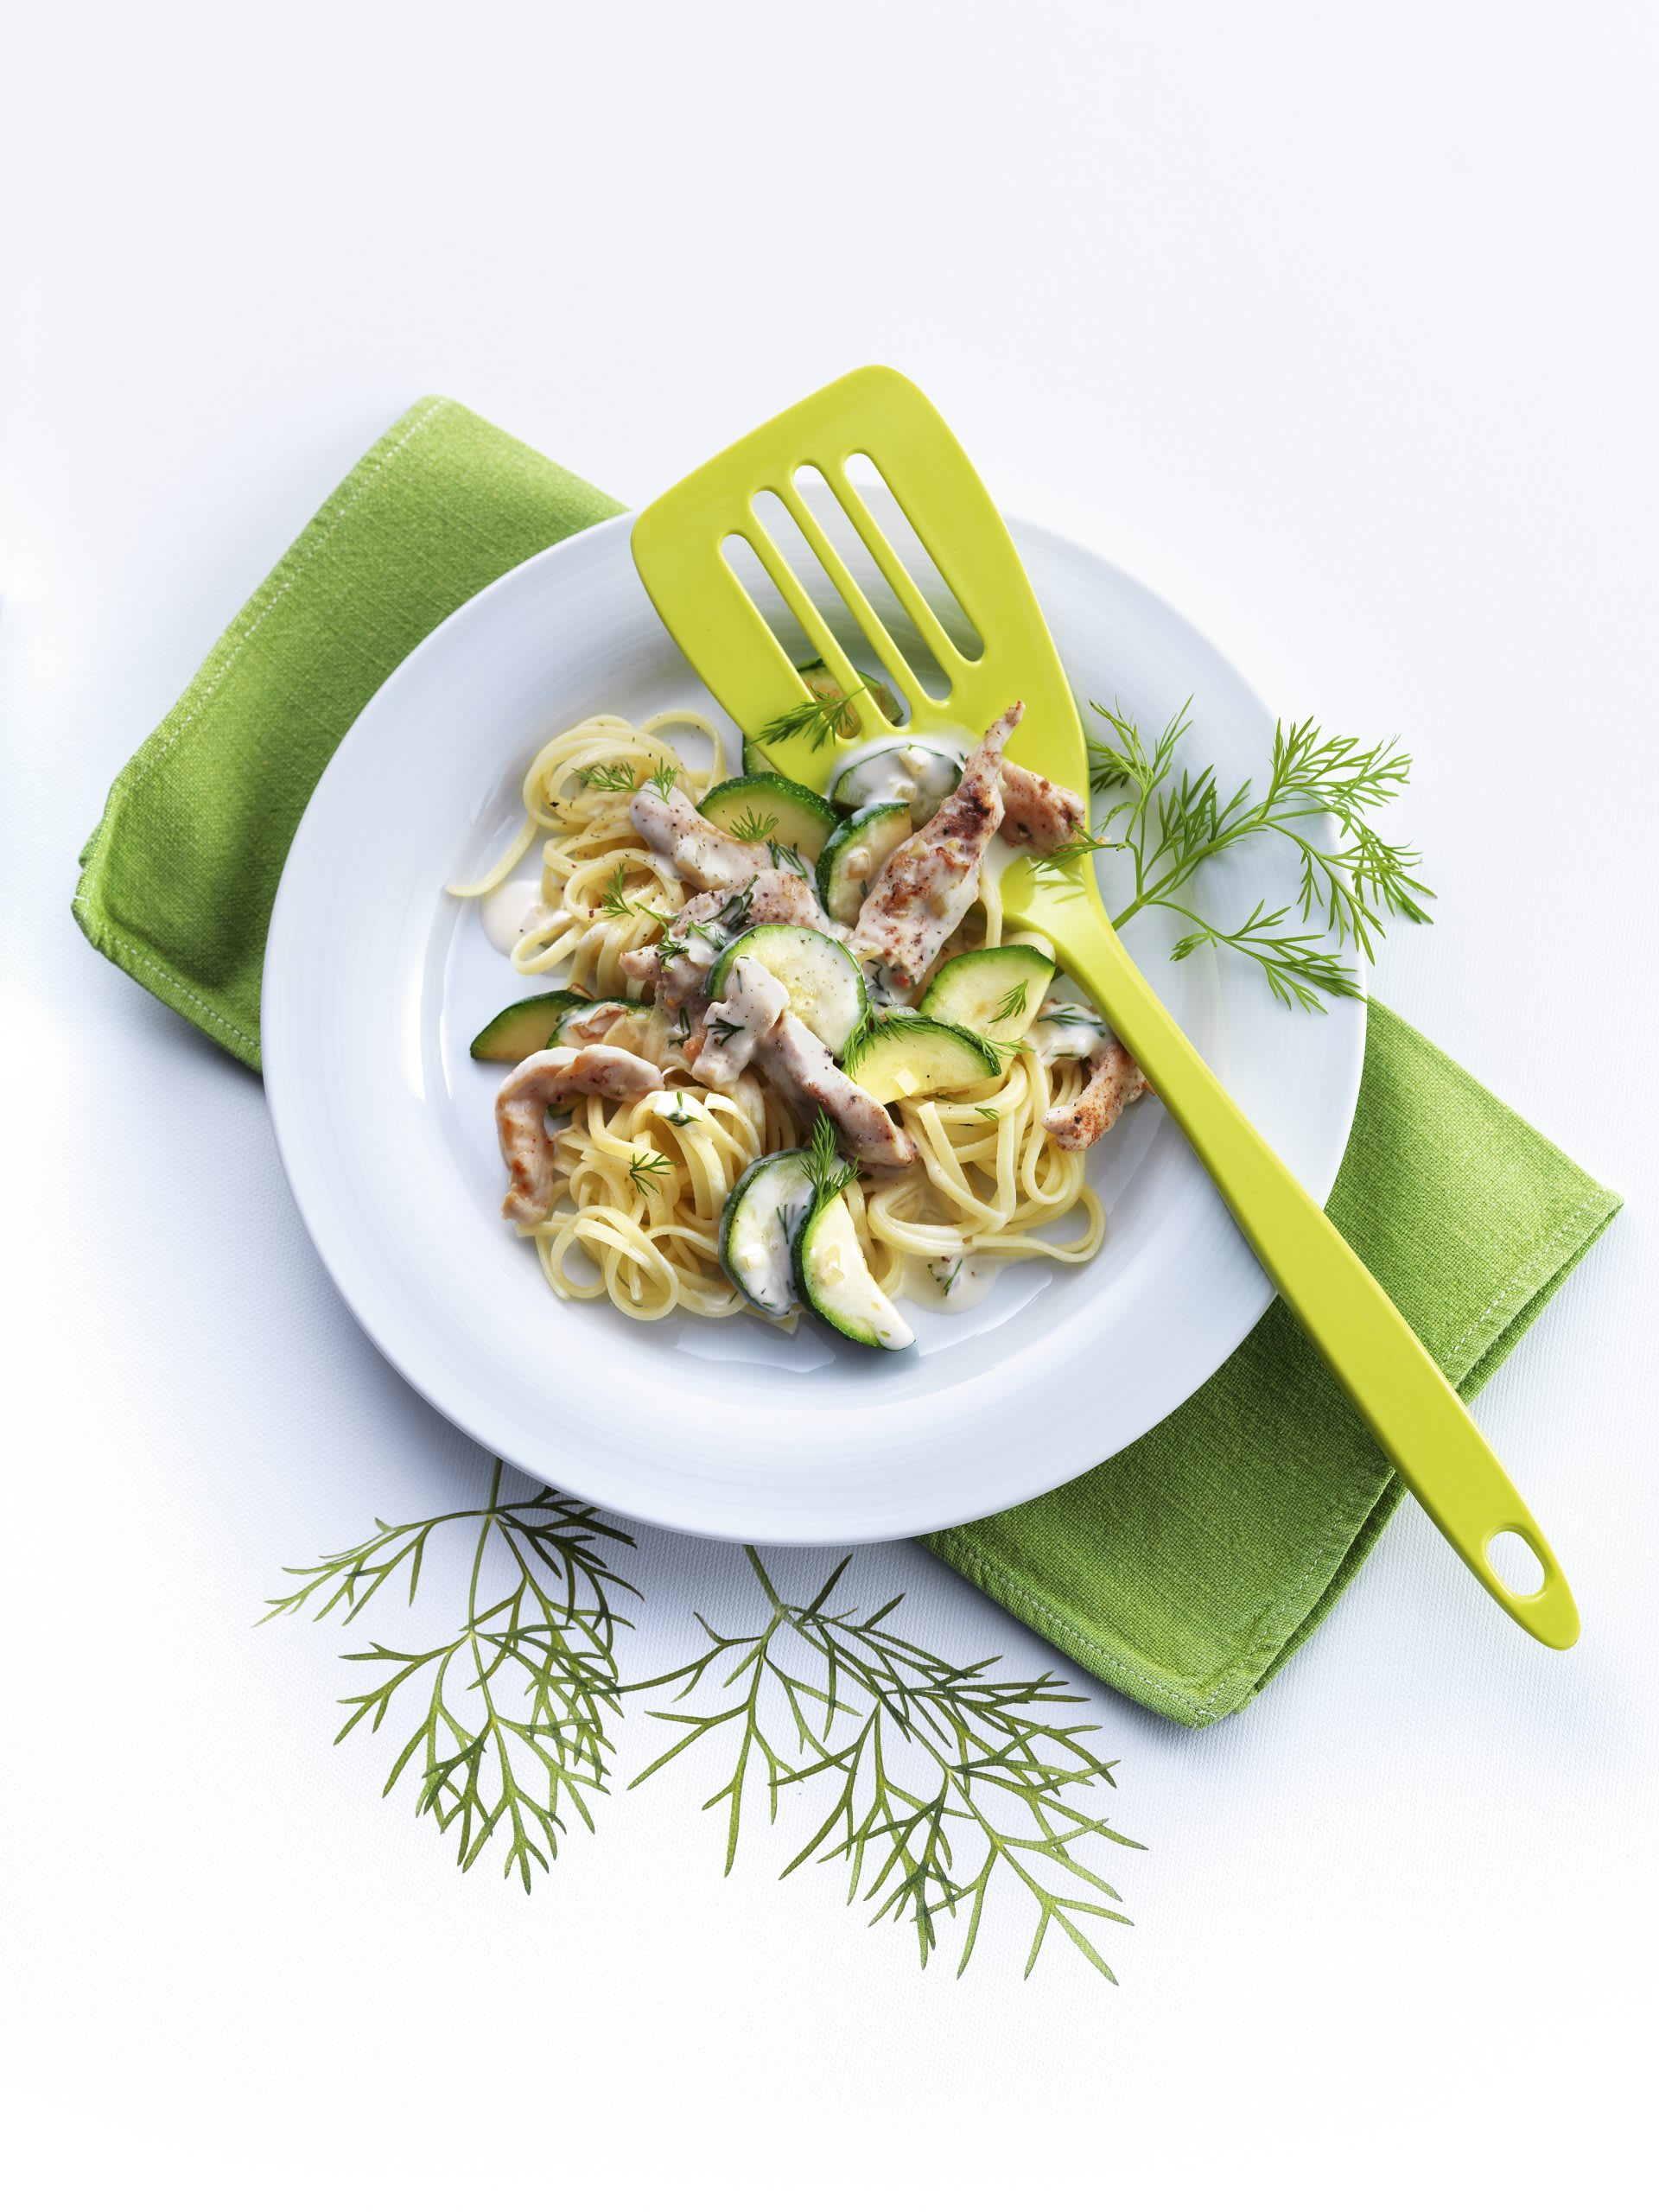 Zucchini-Poulet-Pfanne